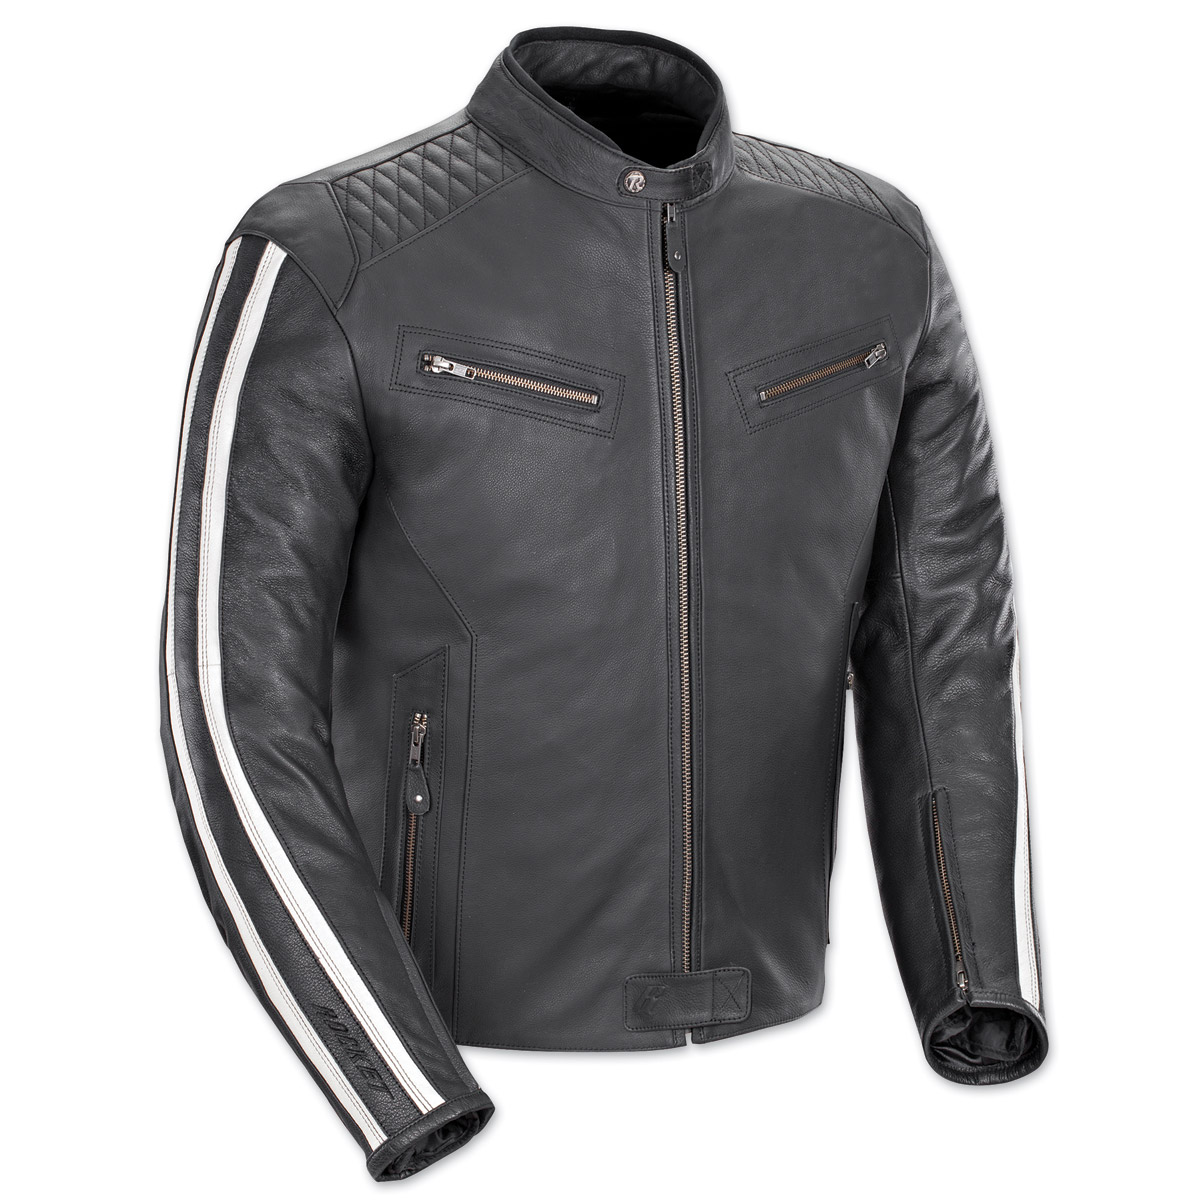 Joe Rocket Men's Vintage Rocket Black/White Leather Jacket